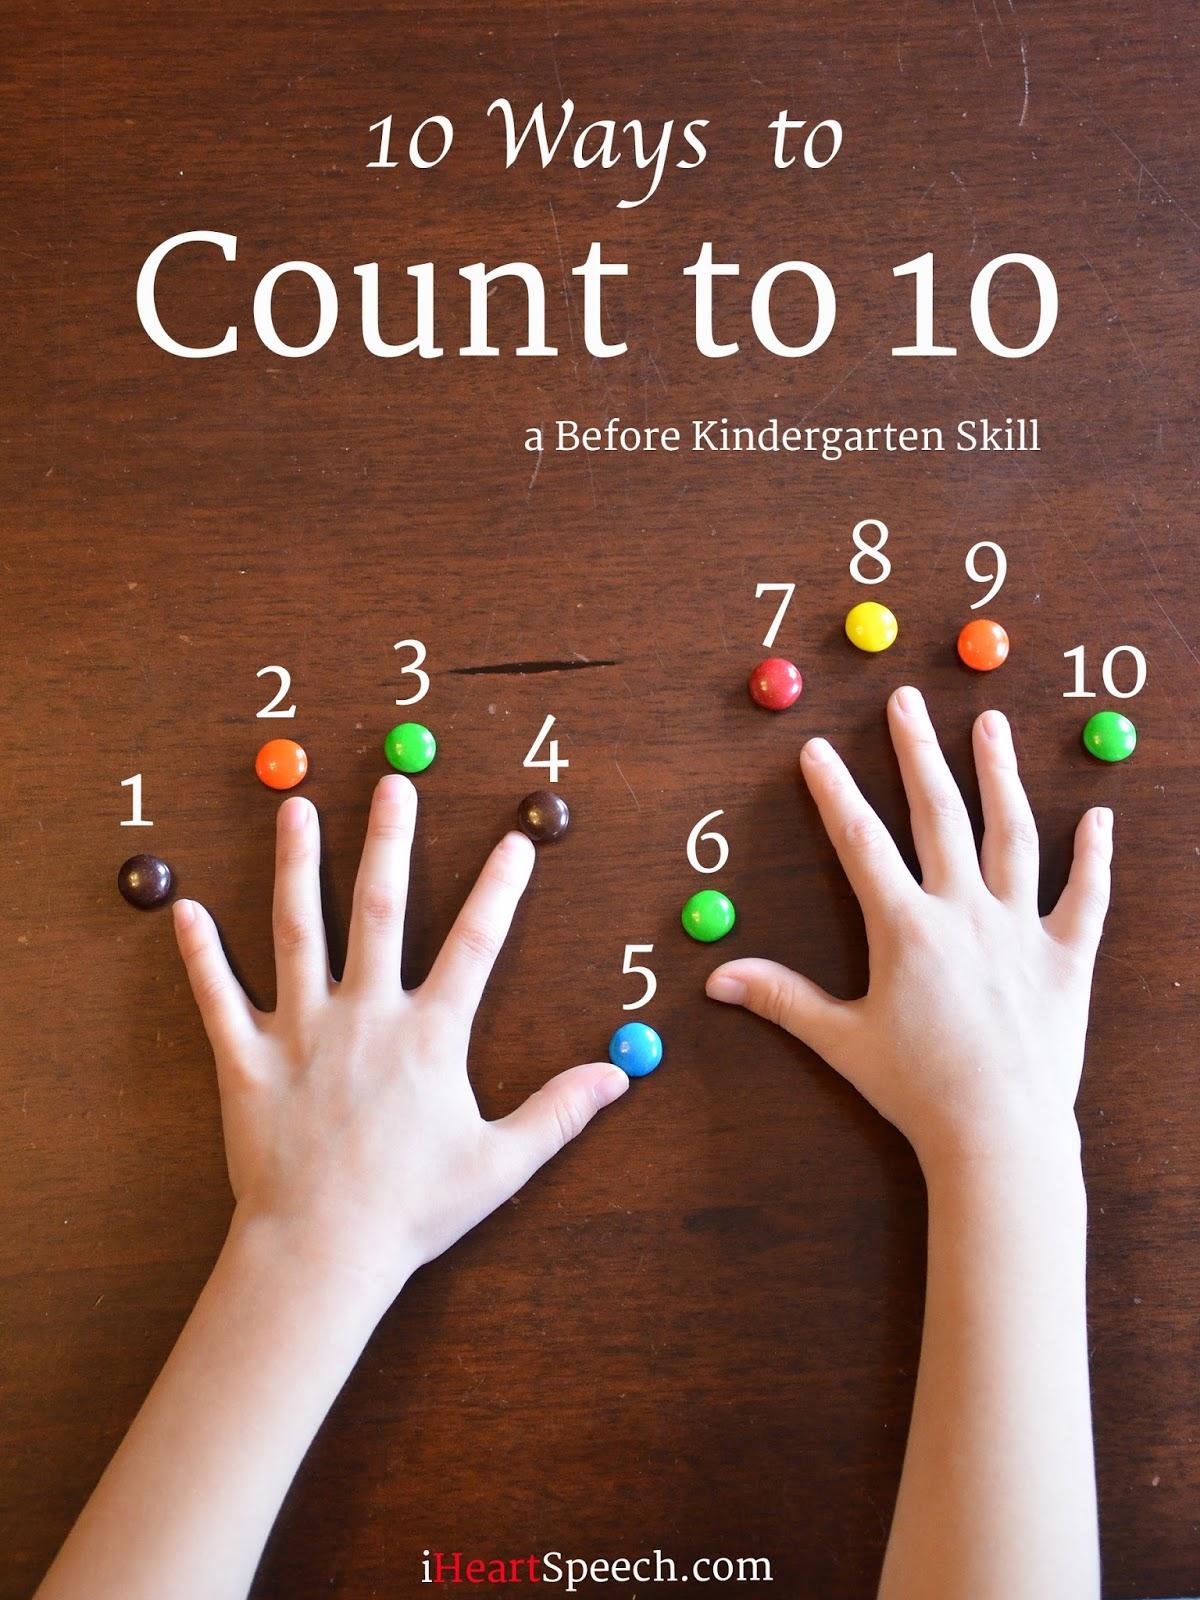 IHeartSpeech.com: 10 Ways To Count To 10